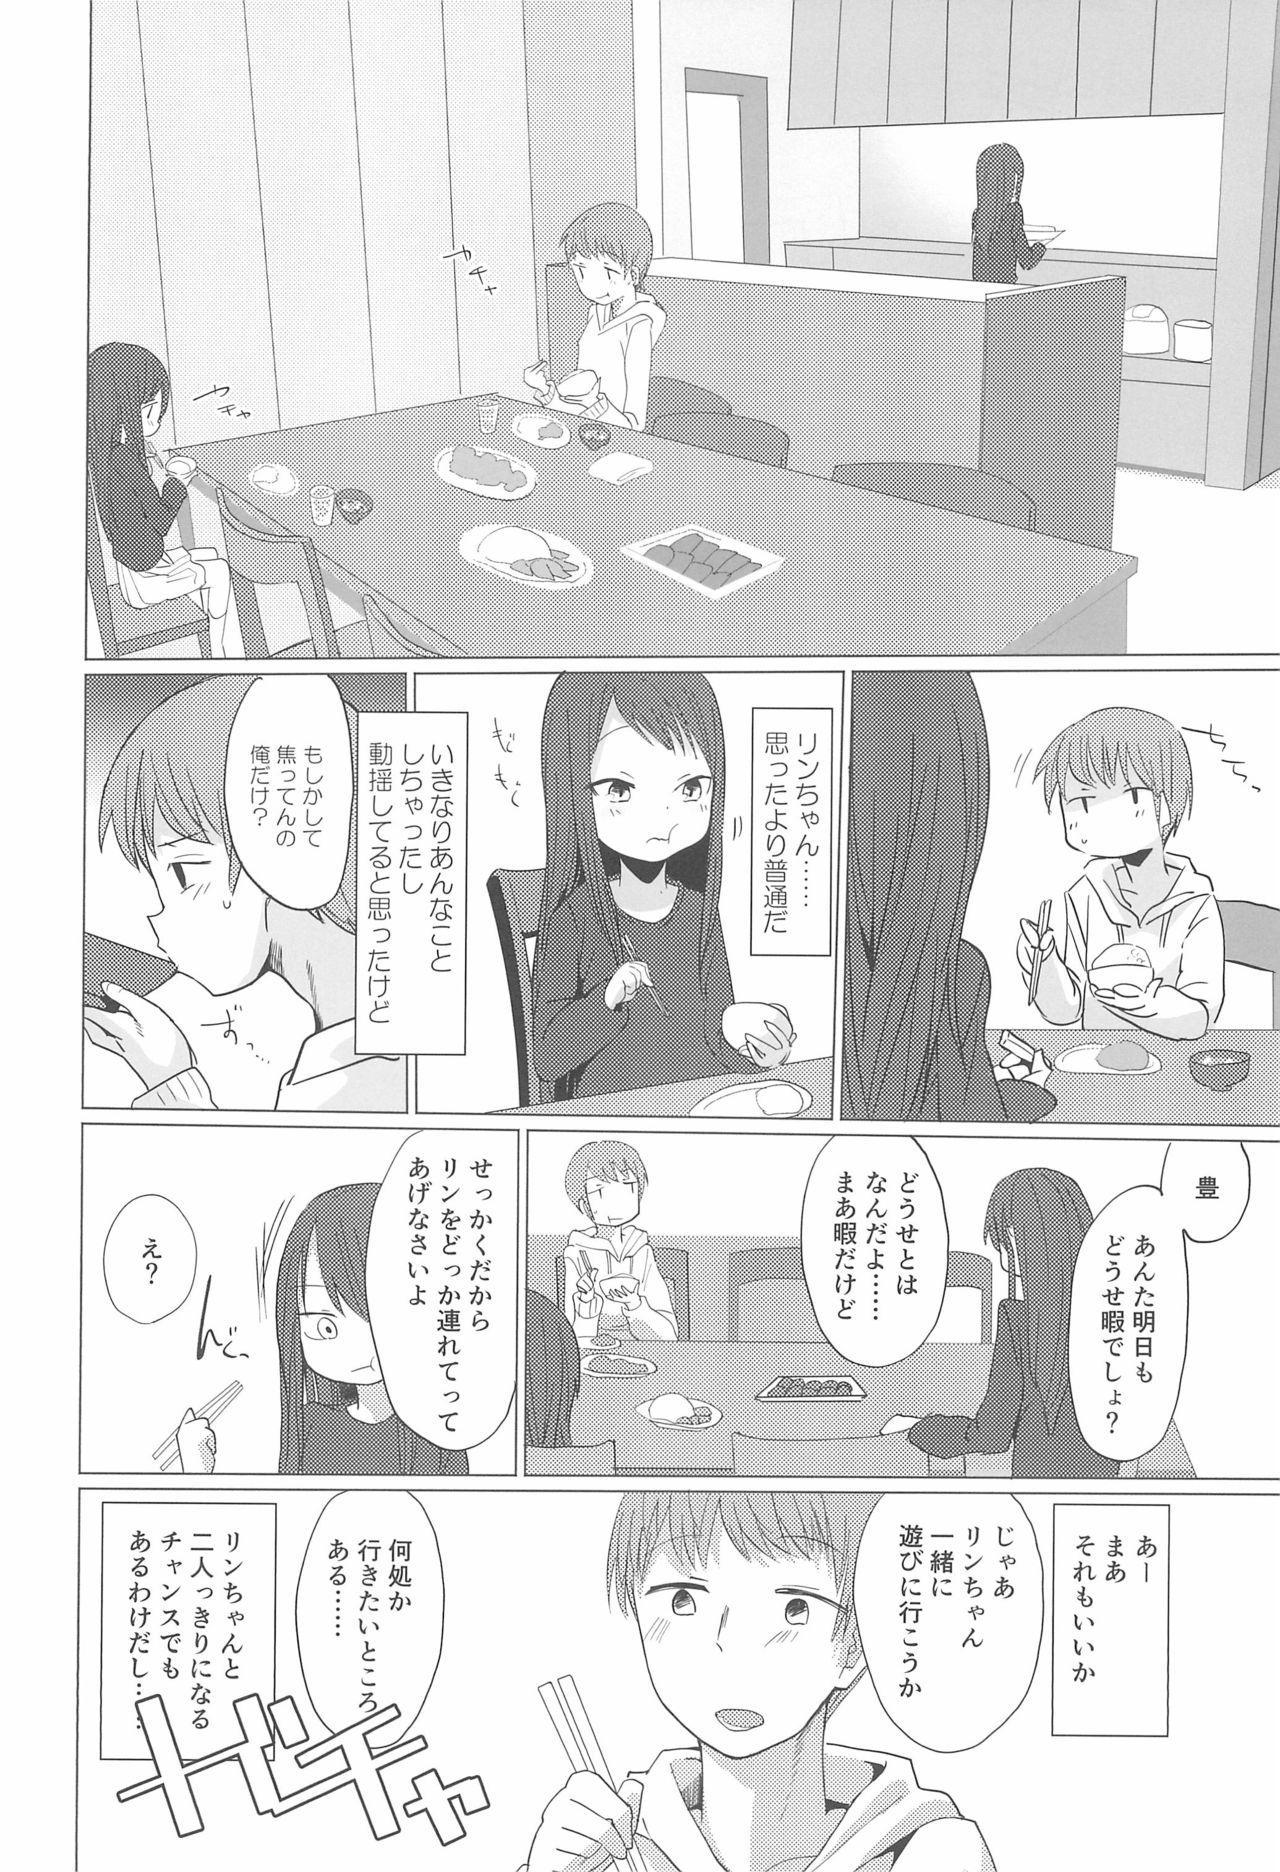 Fuyu wa Inaka ni Kaerou. 13